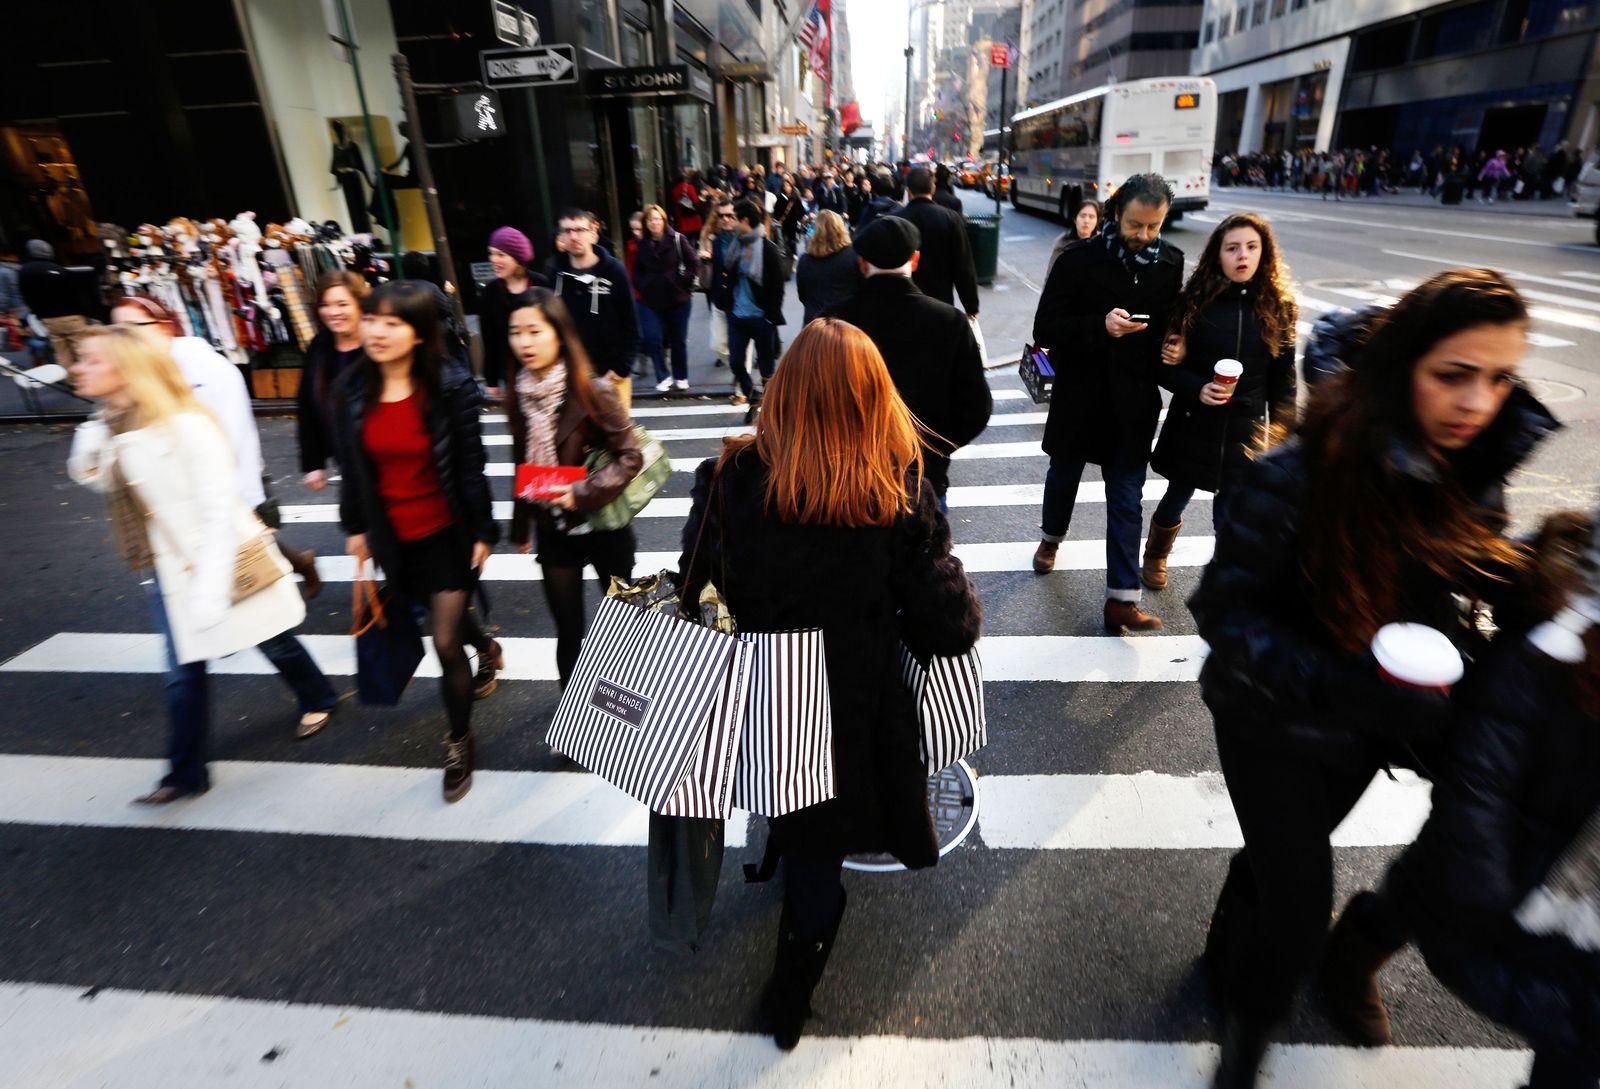 USA / US-Verbraucher / Shopping / Handel / Konsum / KonjunkturShoppen /